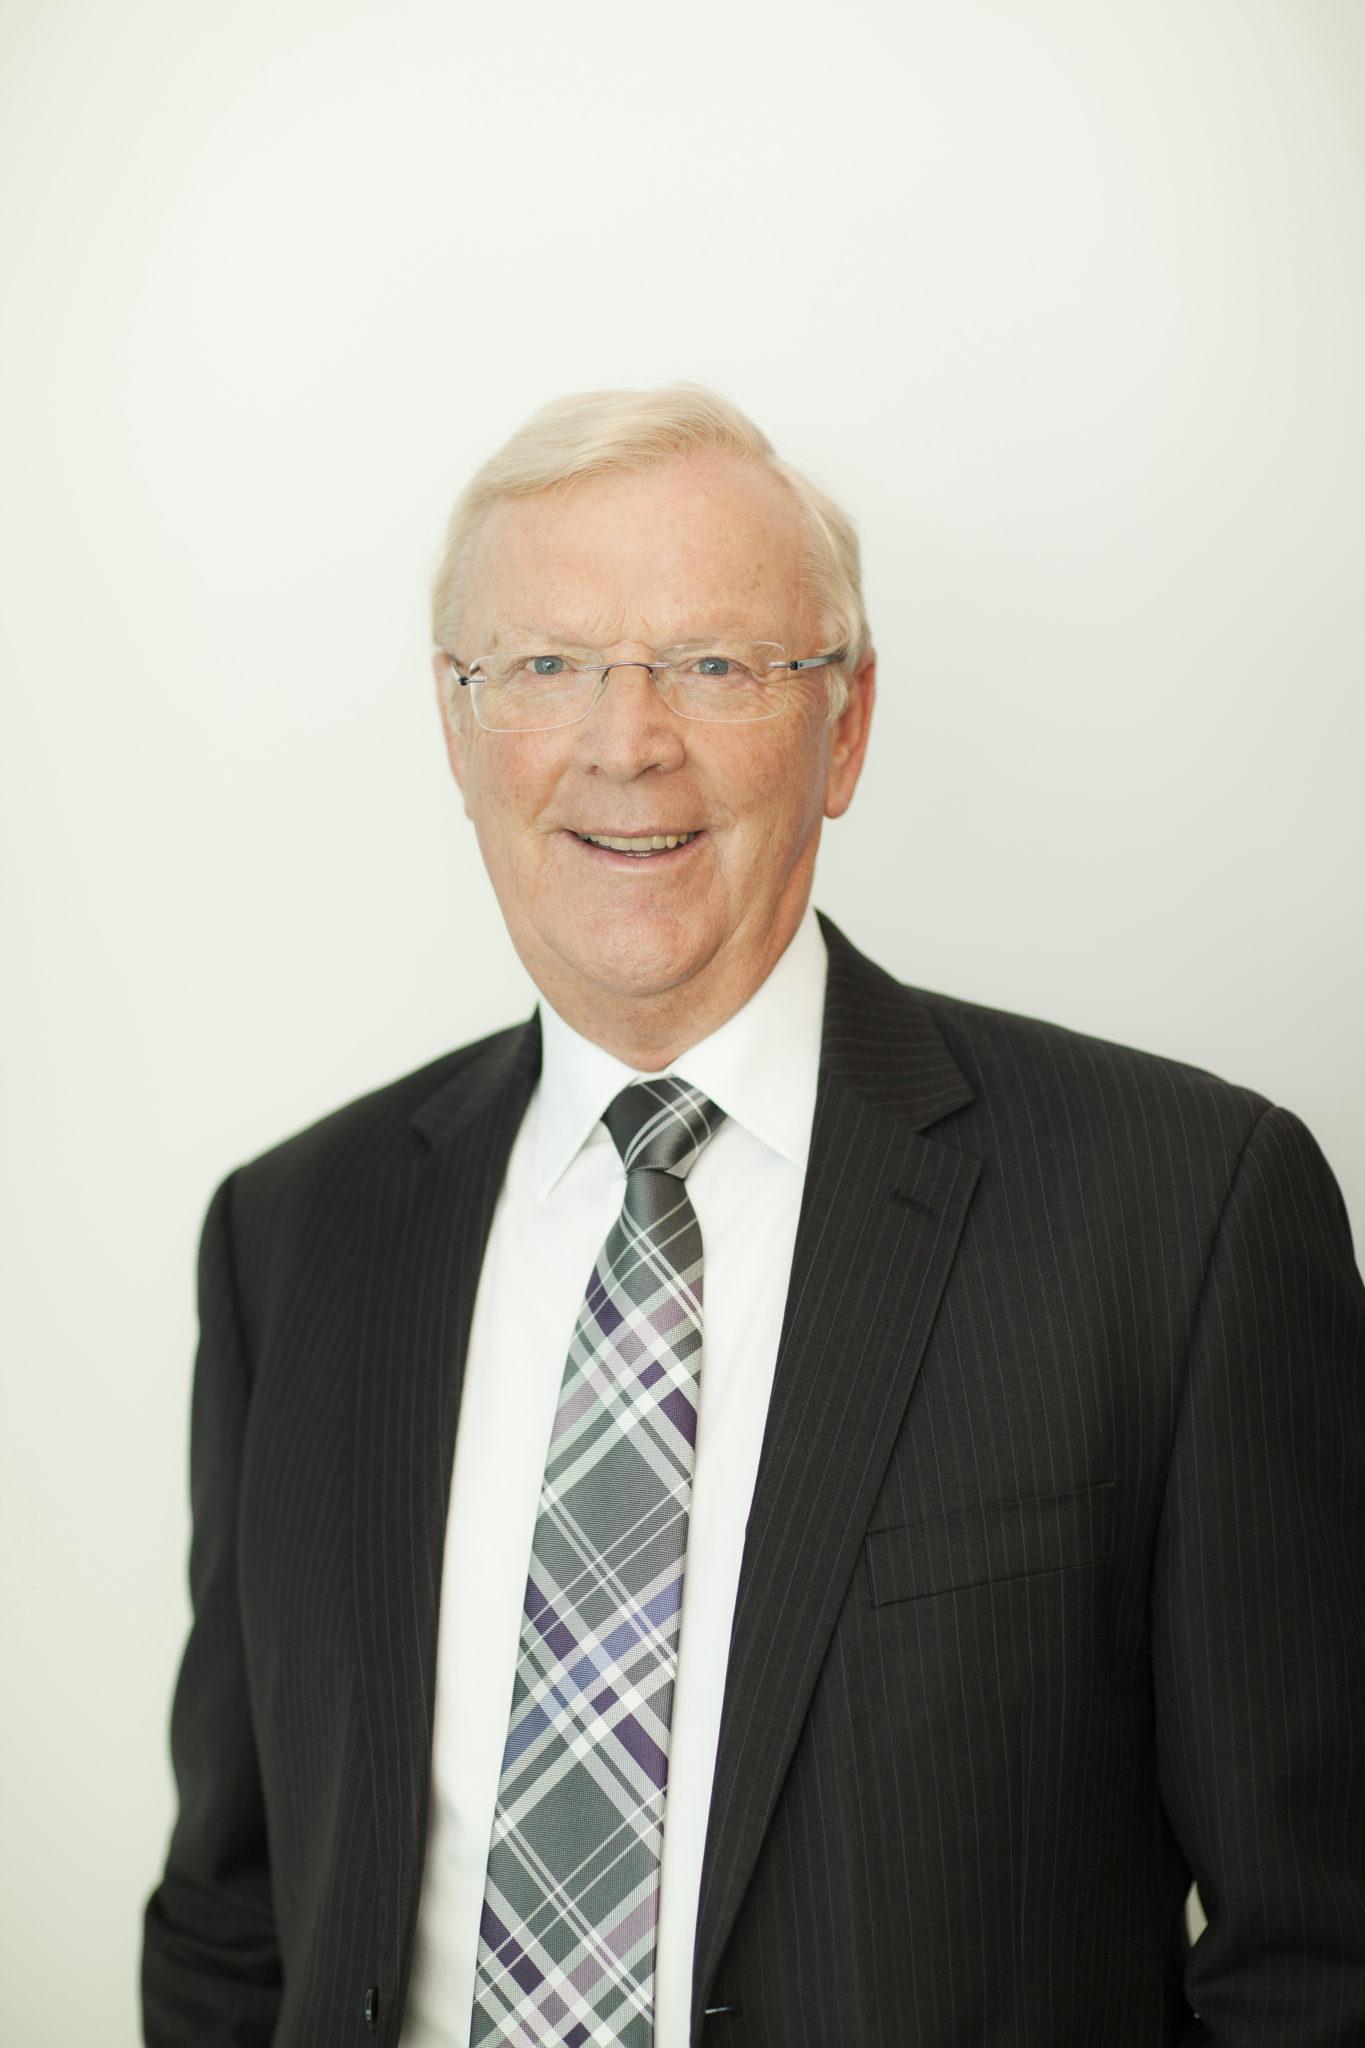 Gerald Quigley